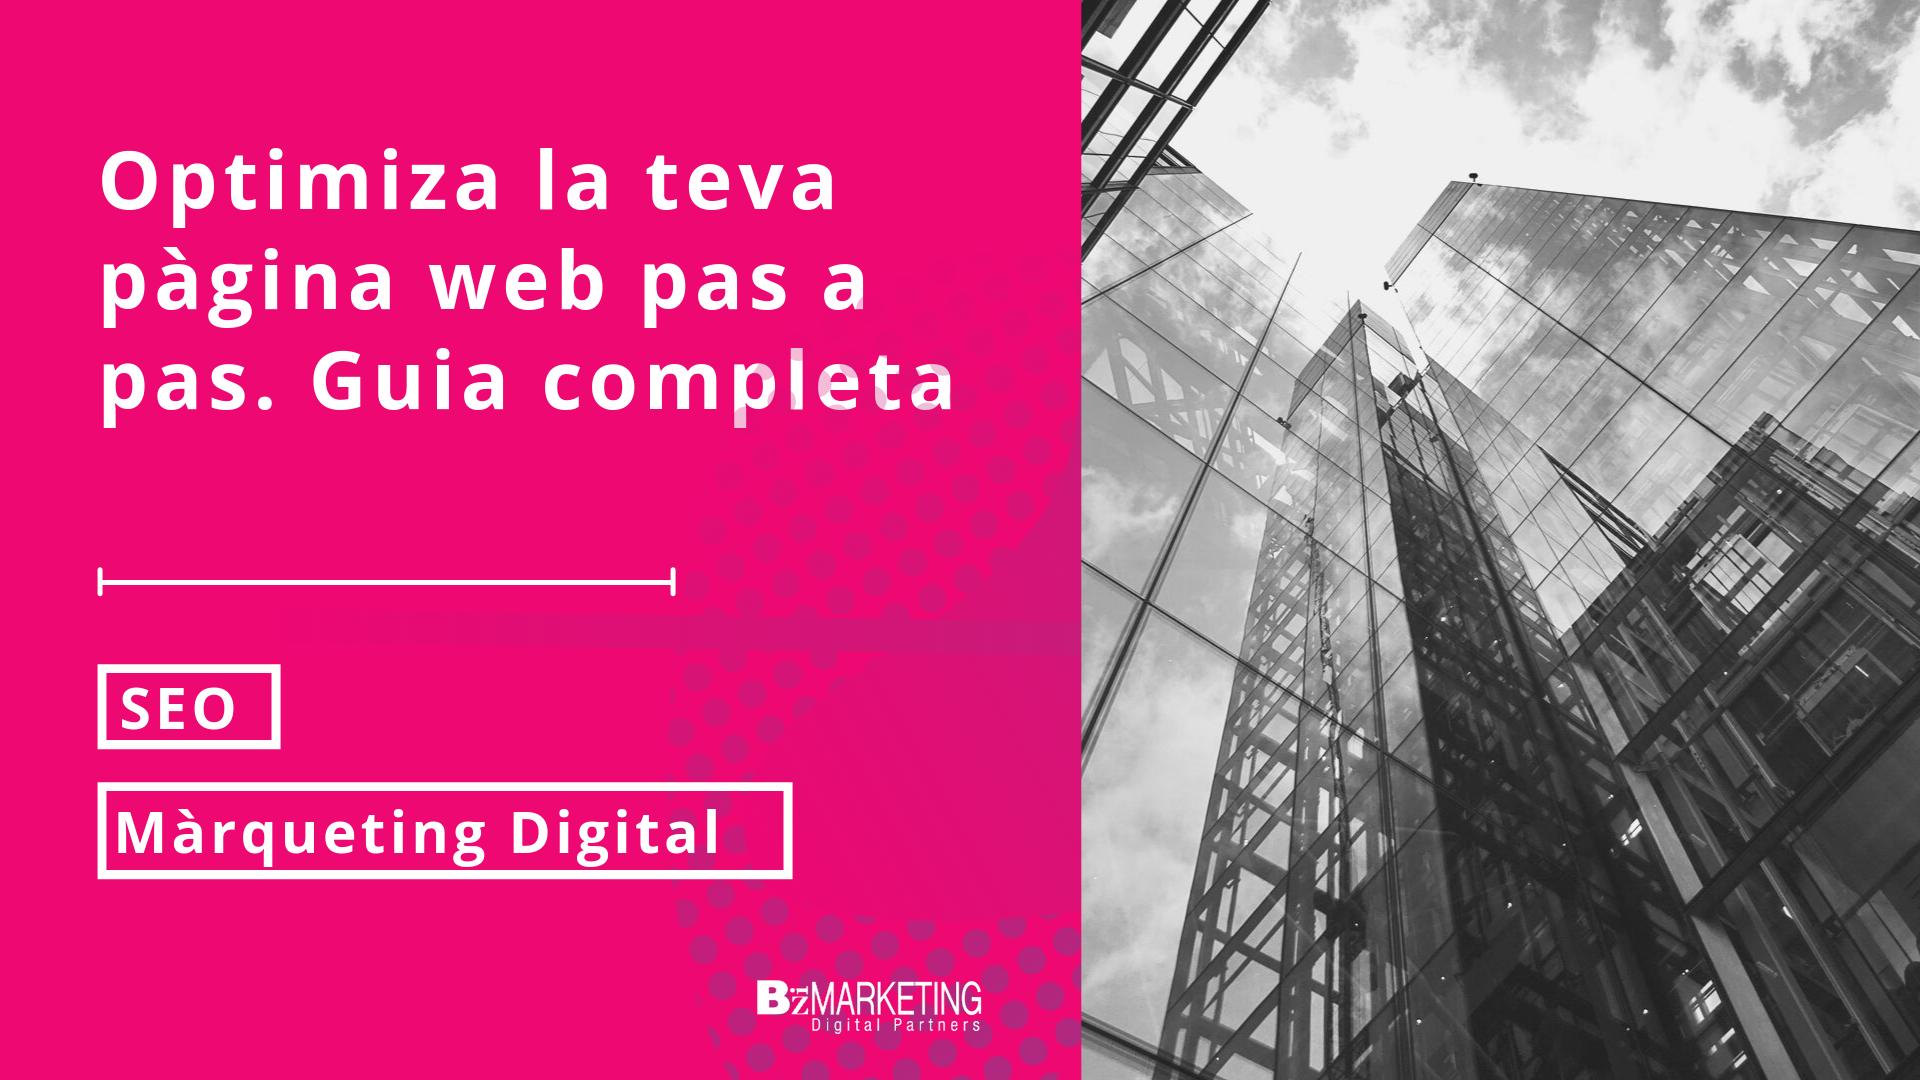 optimitza-la-teva-pagina-web-pas-a-oas-guia-completa-inbound-marketing-bizmarketing